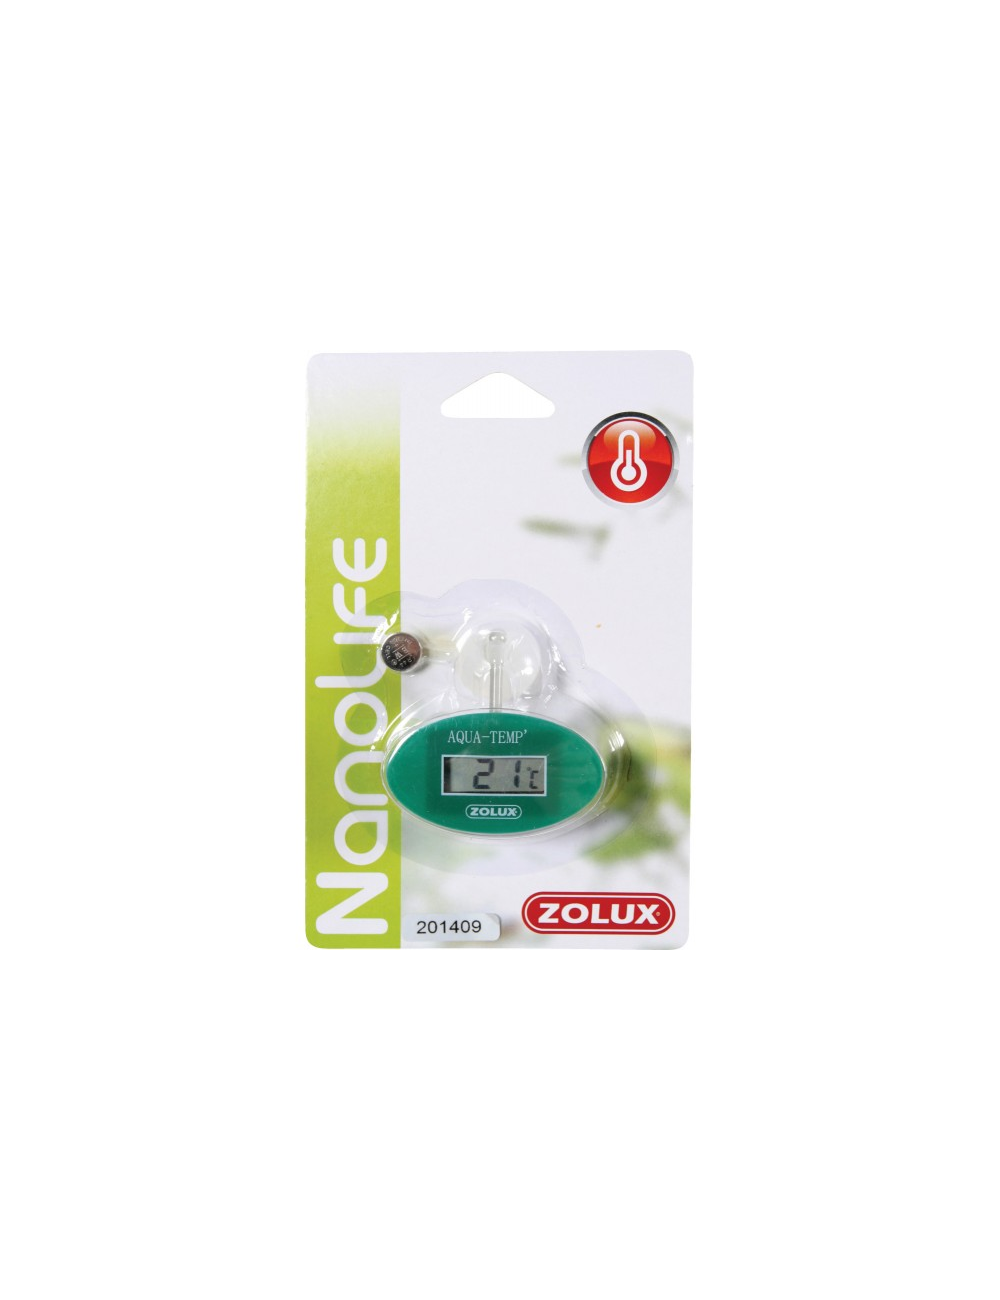 ZOLUX - Aqua Temp - Thermomètre digital